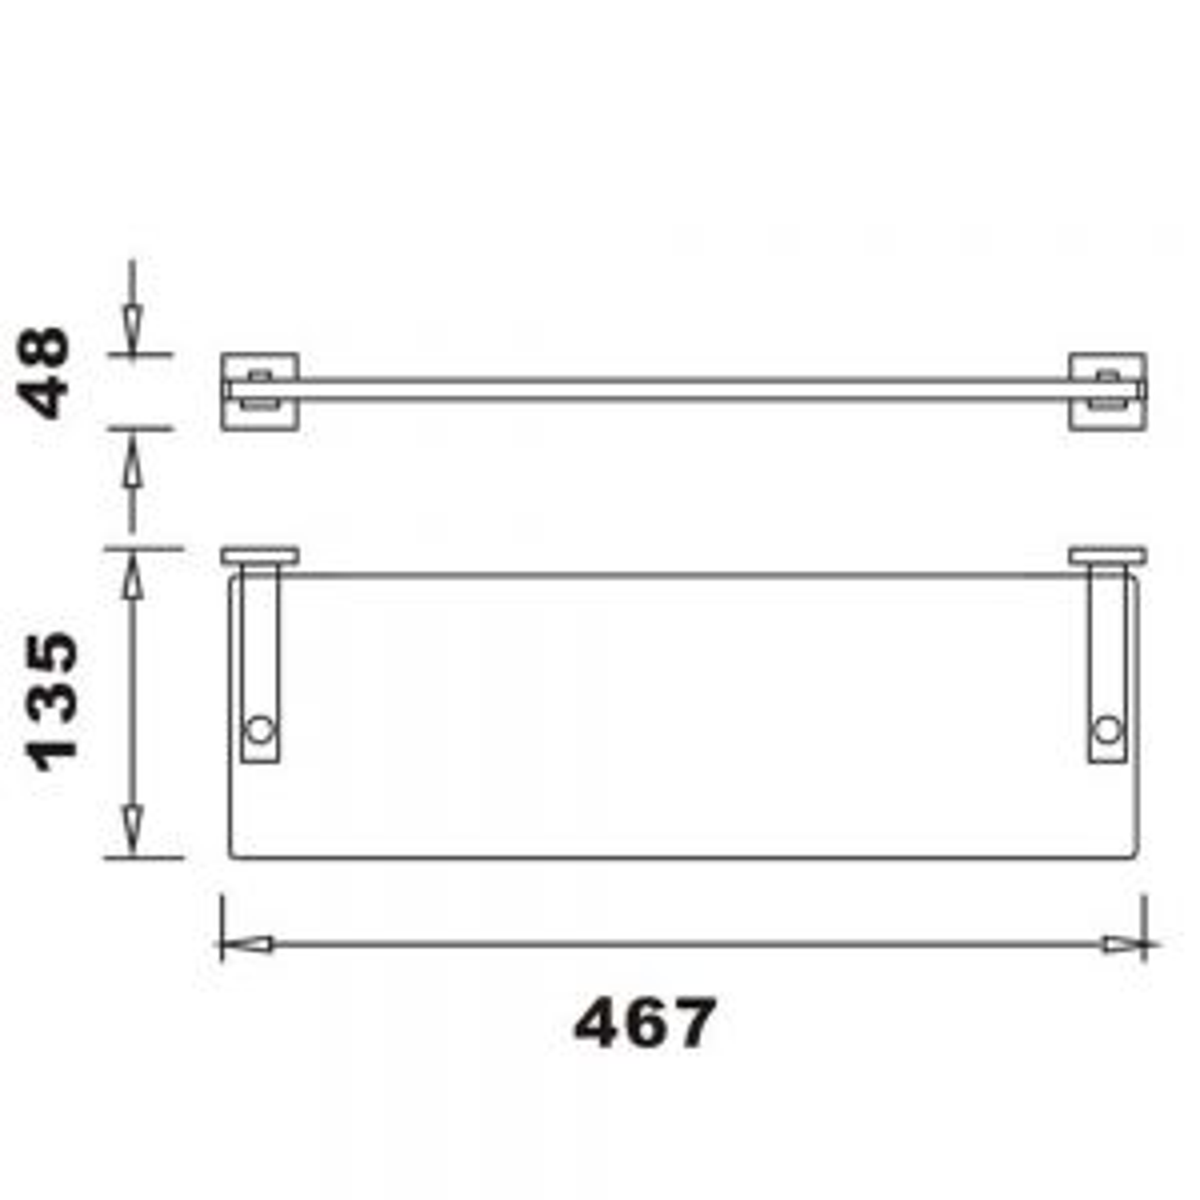 RAK Cubis Glass Shelf Measurements